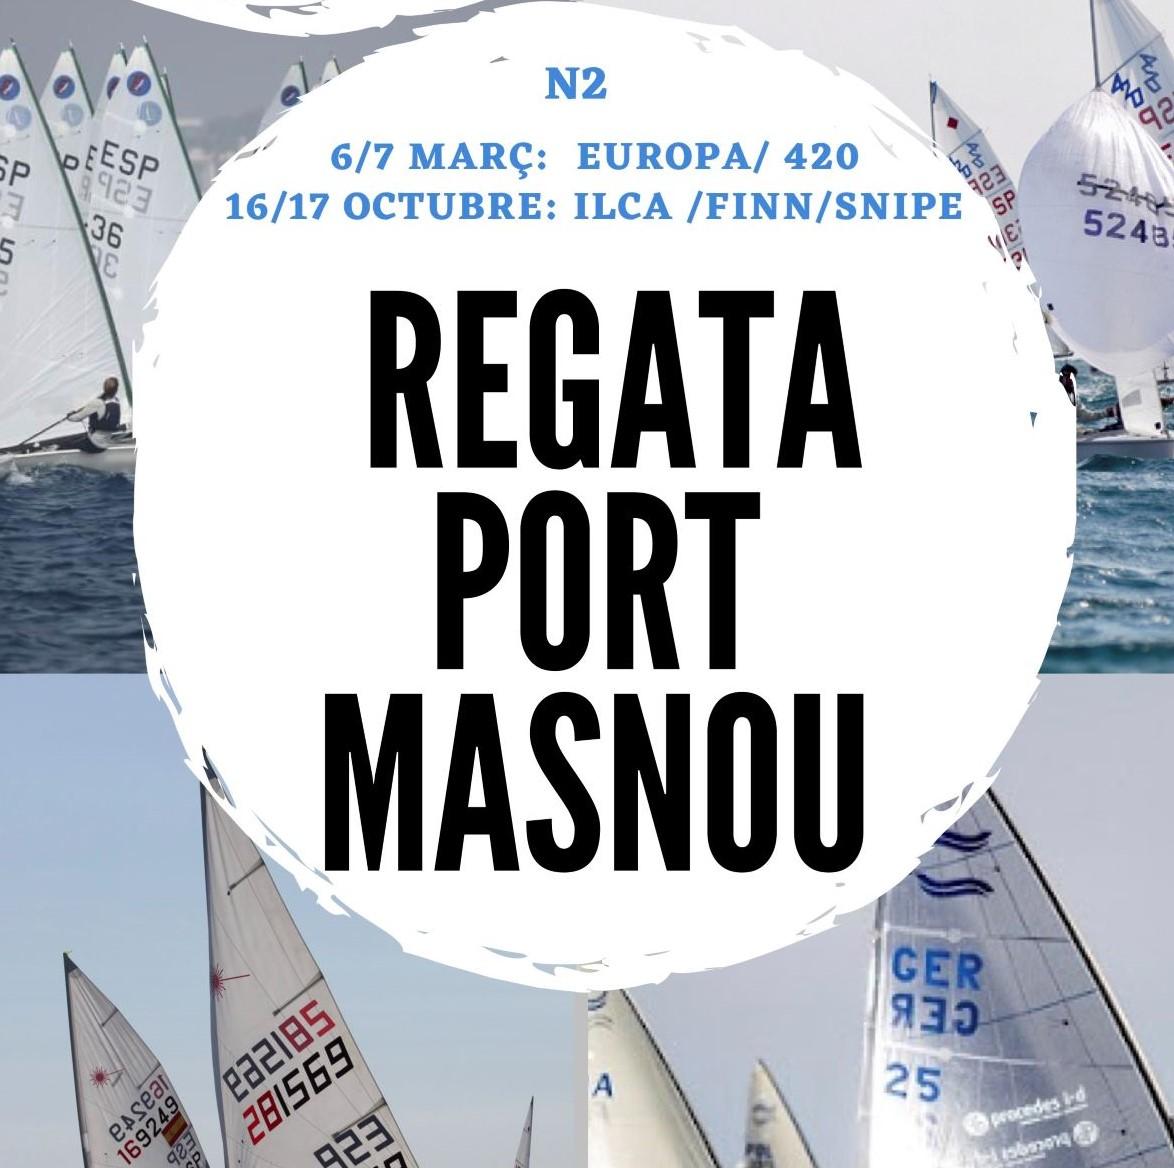 regata, port masnou, laser, 420